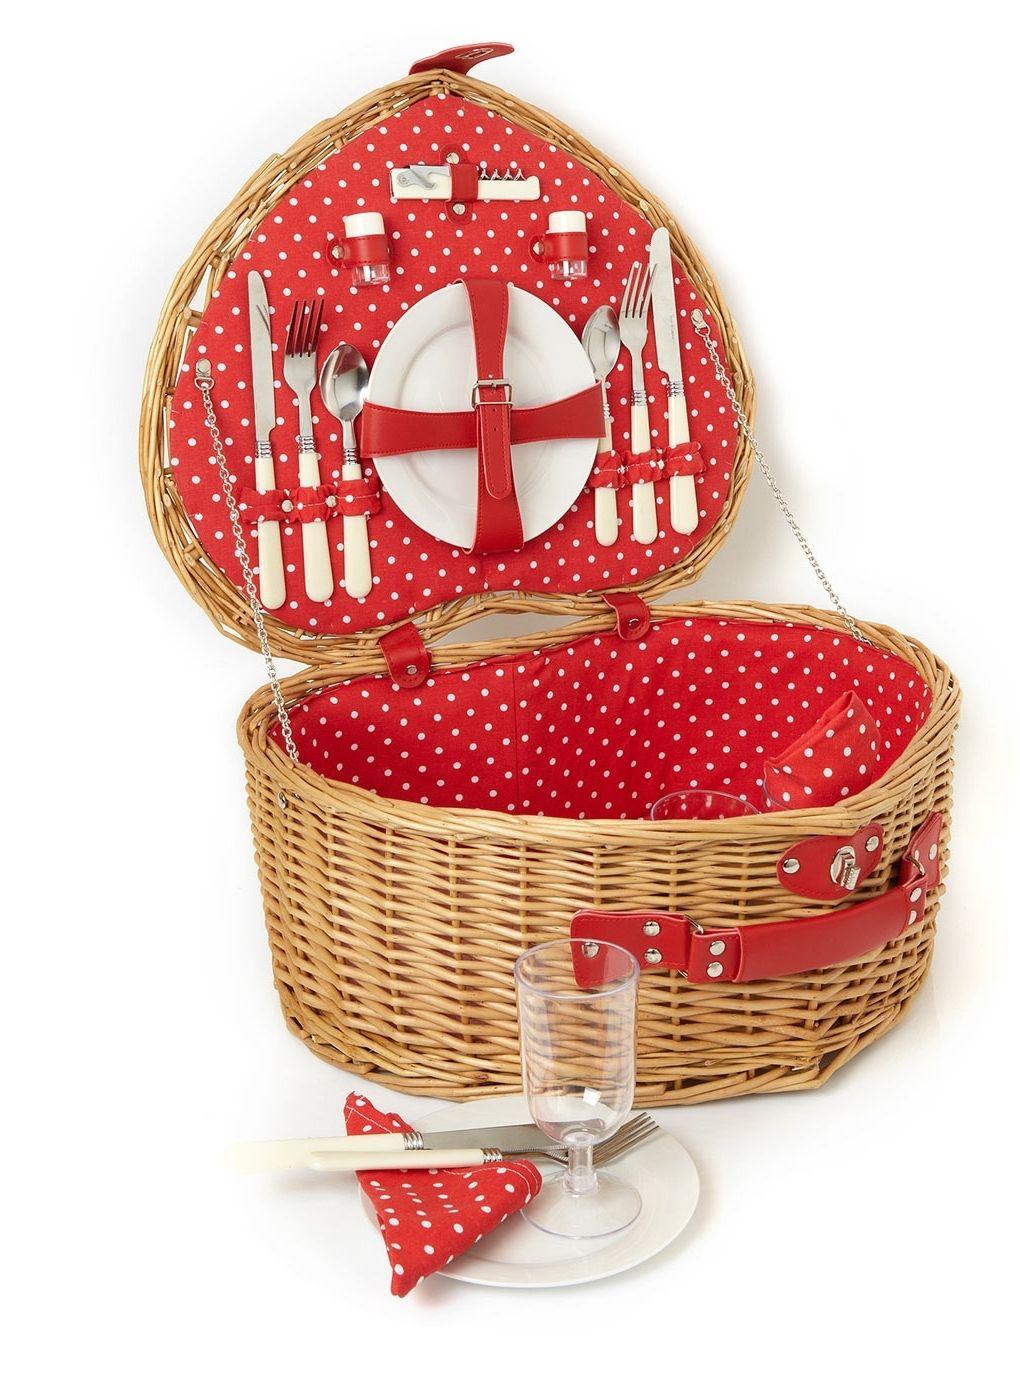 Picnic Hamper Baskets Bhs